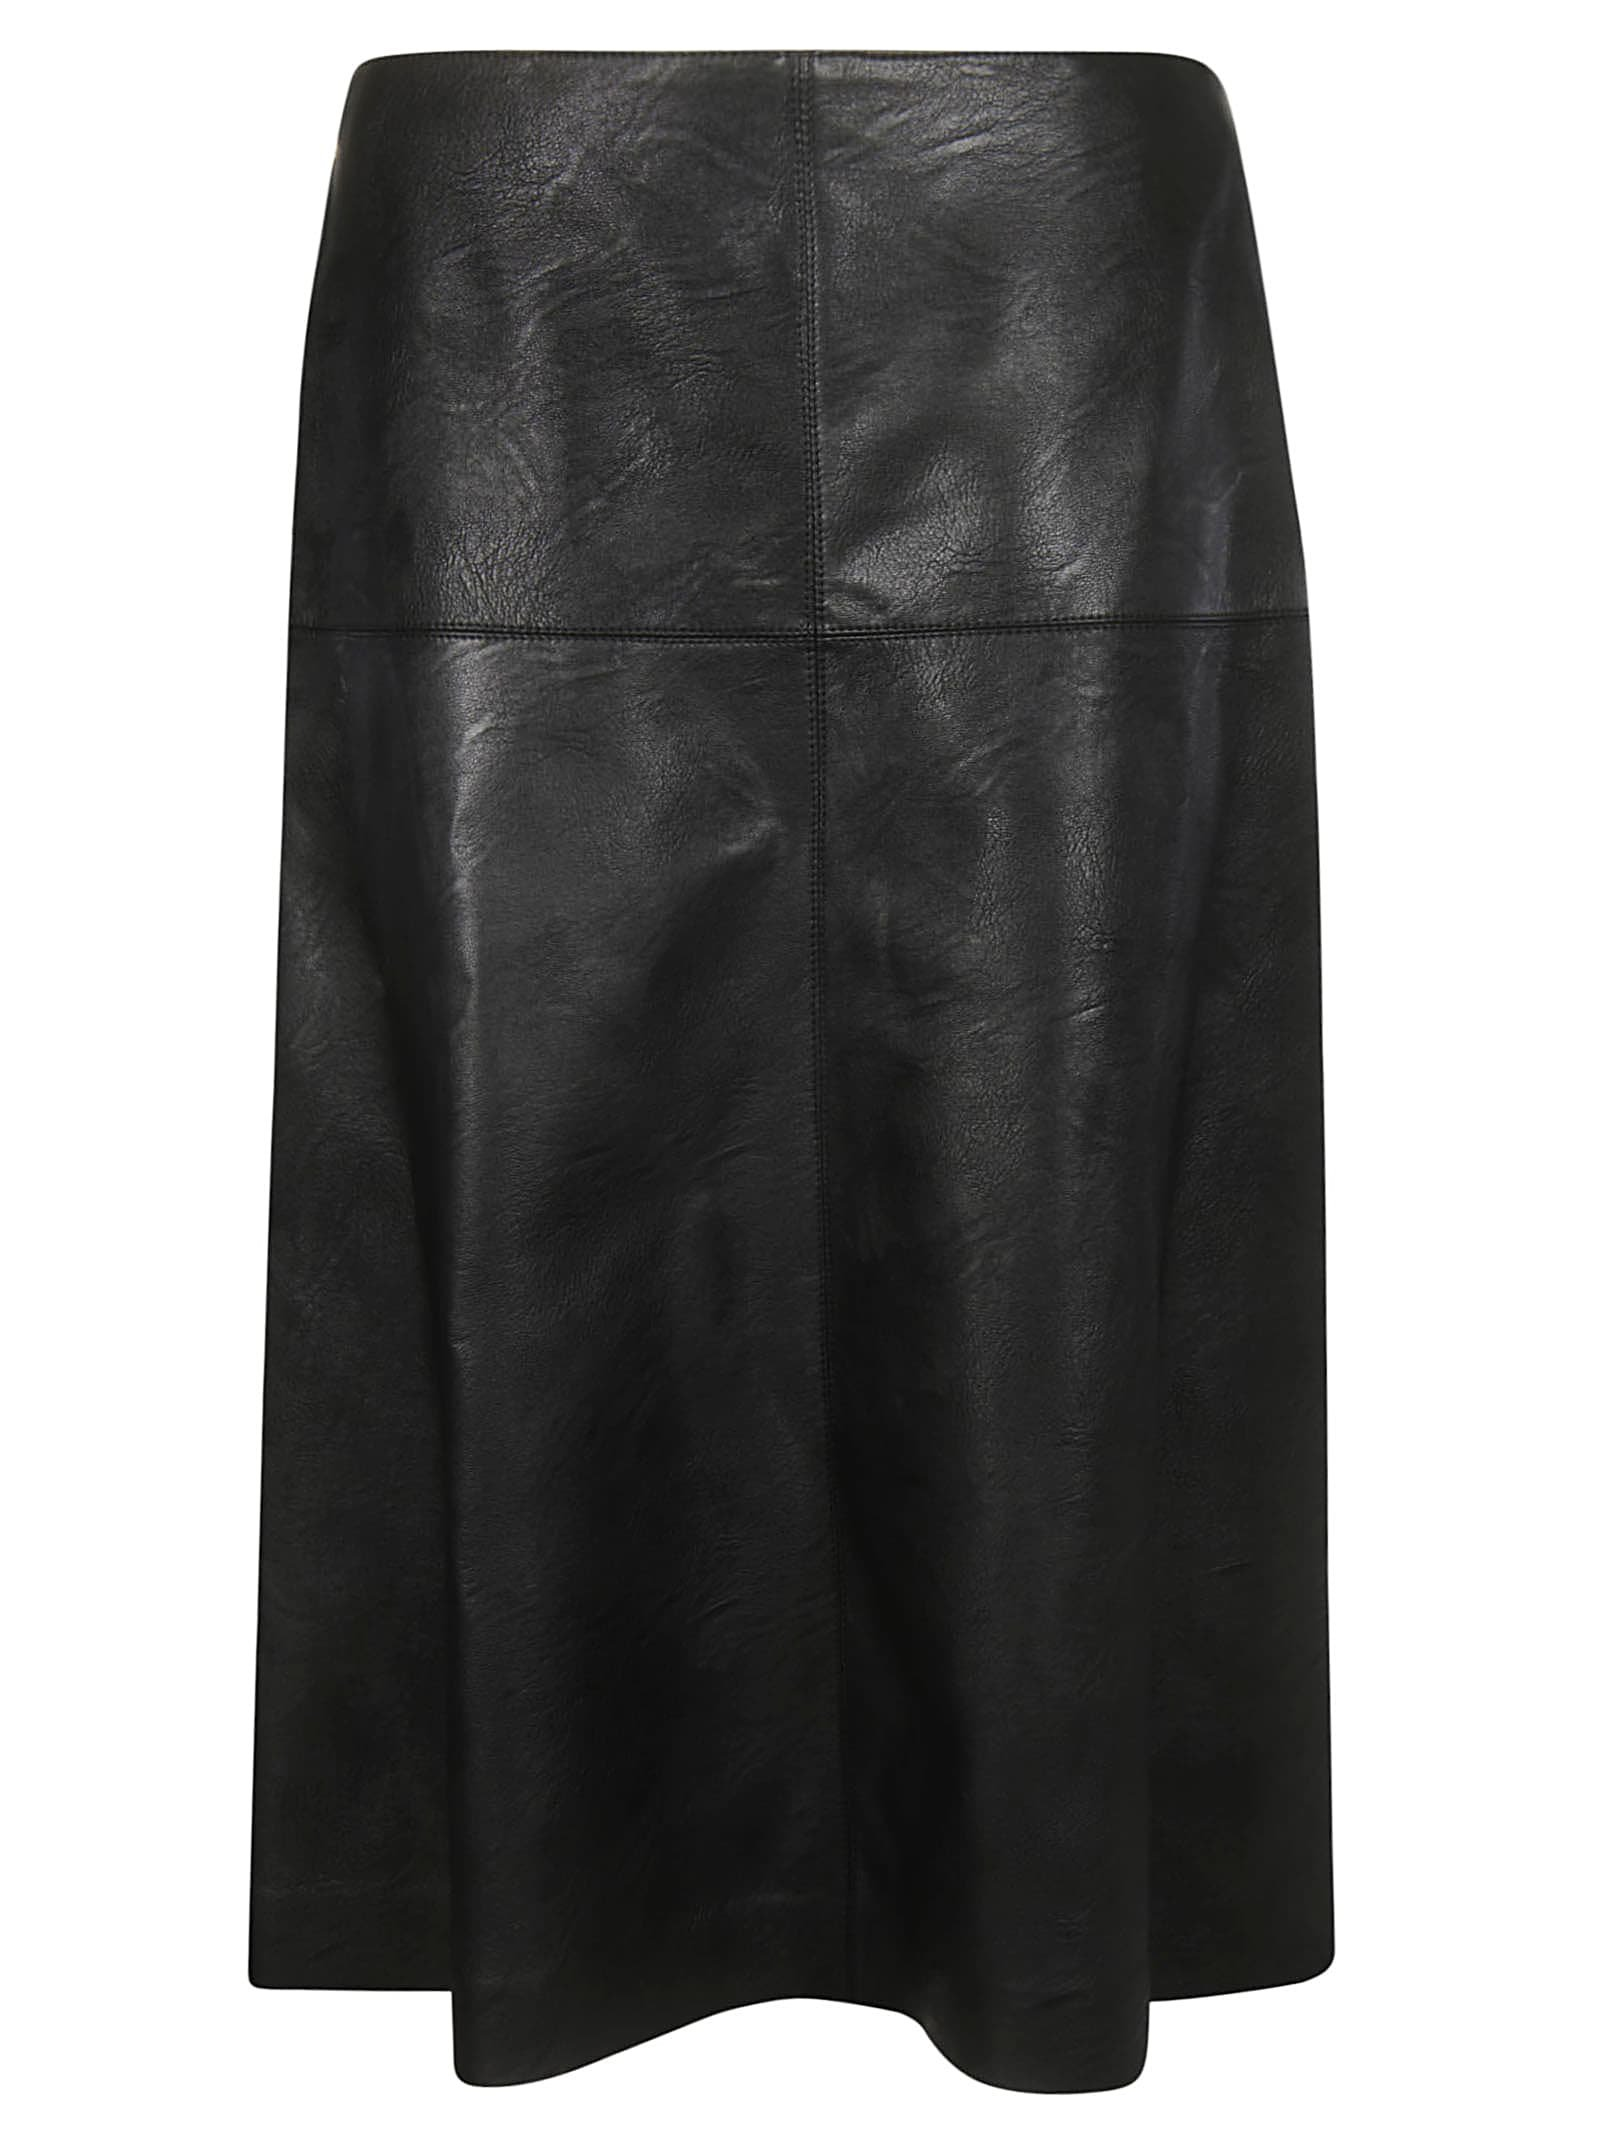 Stella McCartney Leather Skirt